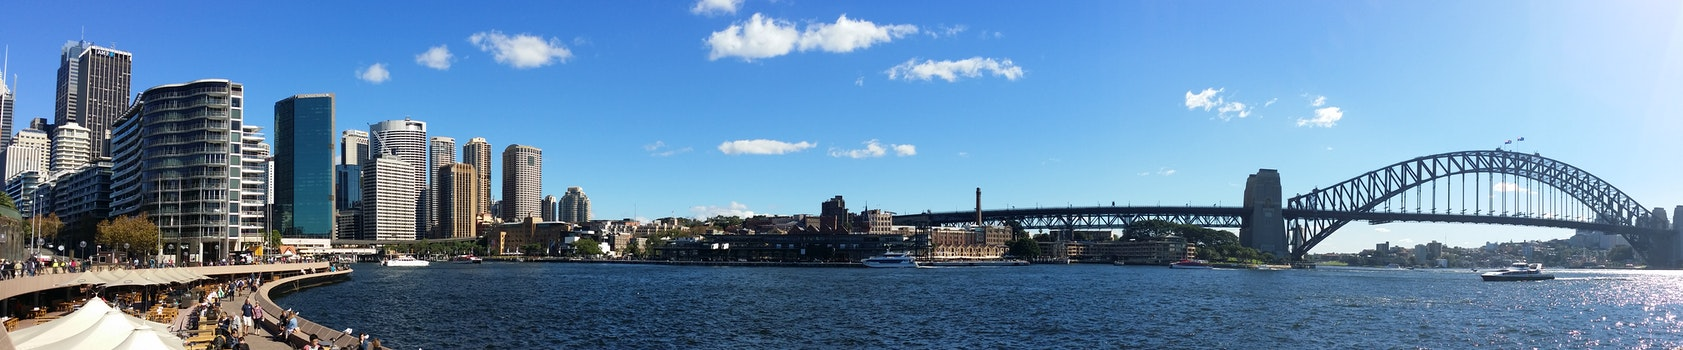 Free stock photo of skyline, summer, bridge, harbour